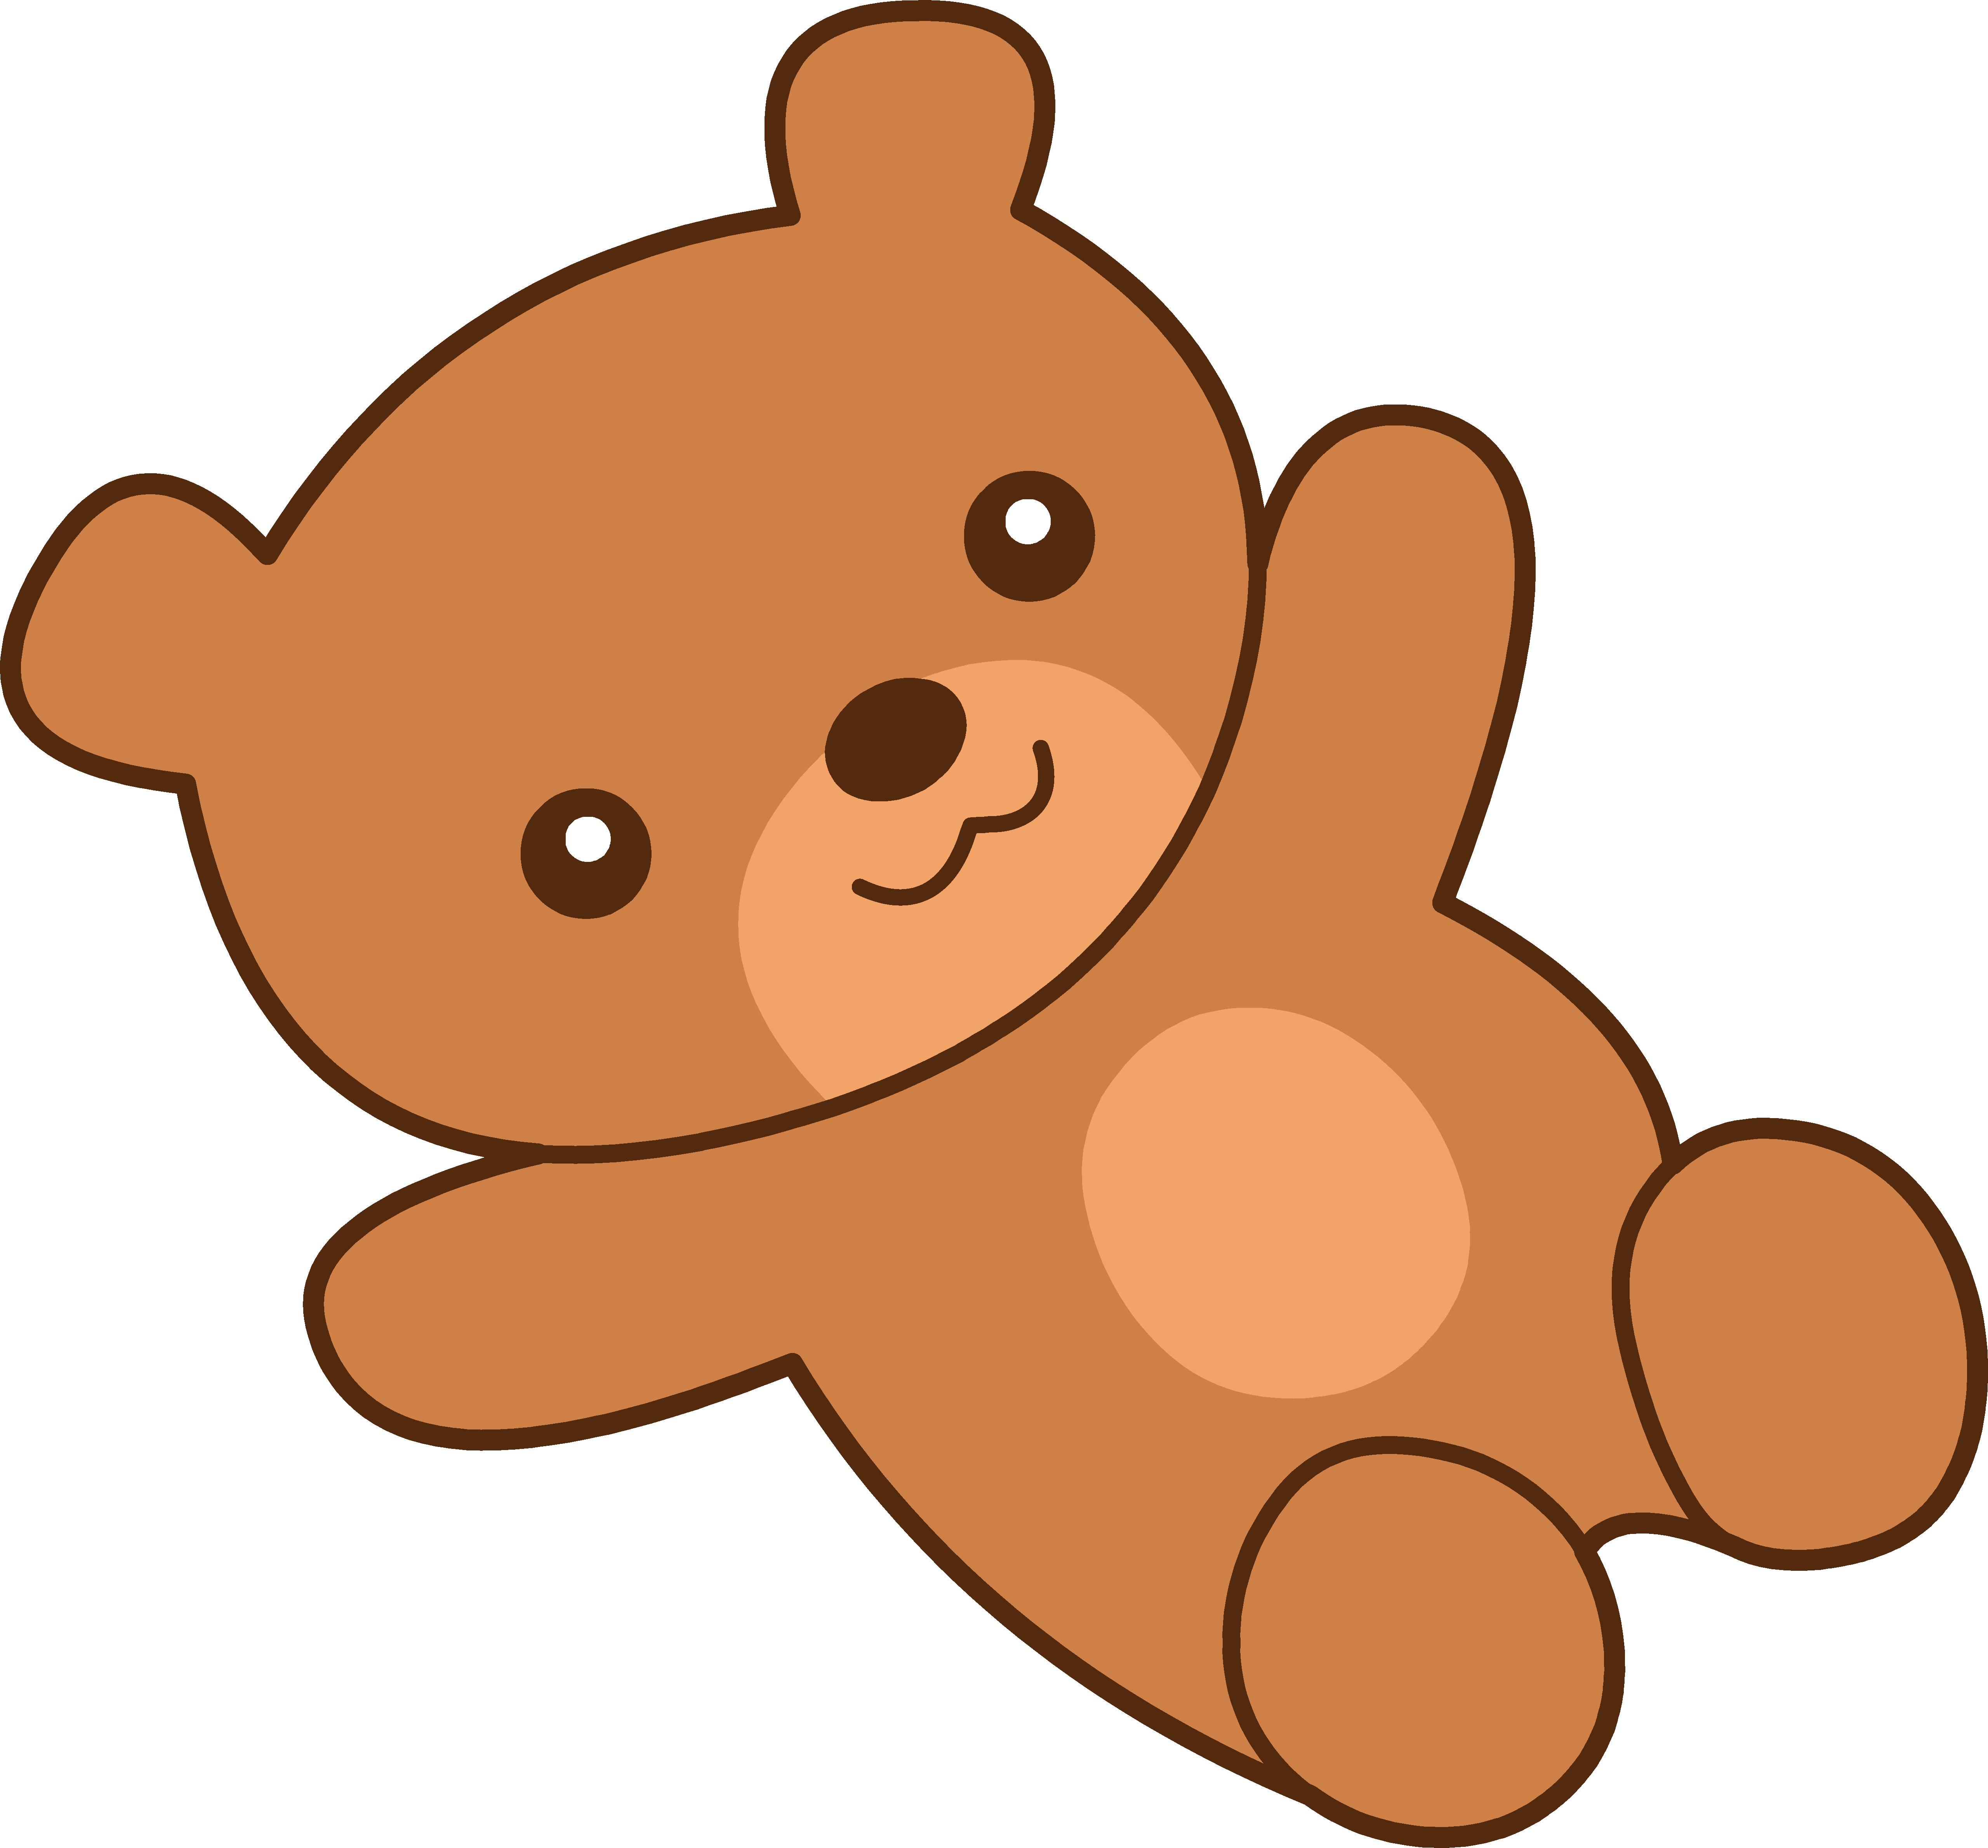 Teddy Bear Clipart Free Clipart Images 3-Teddy bear clipart free clipart images 3-15